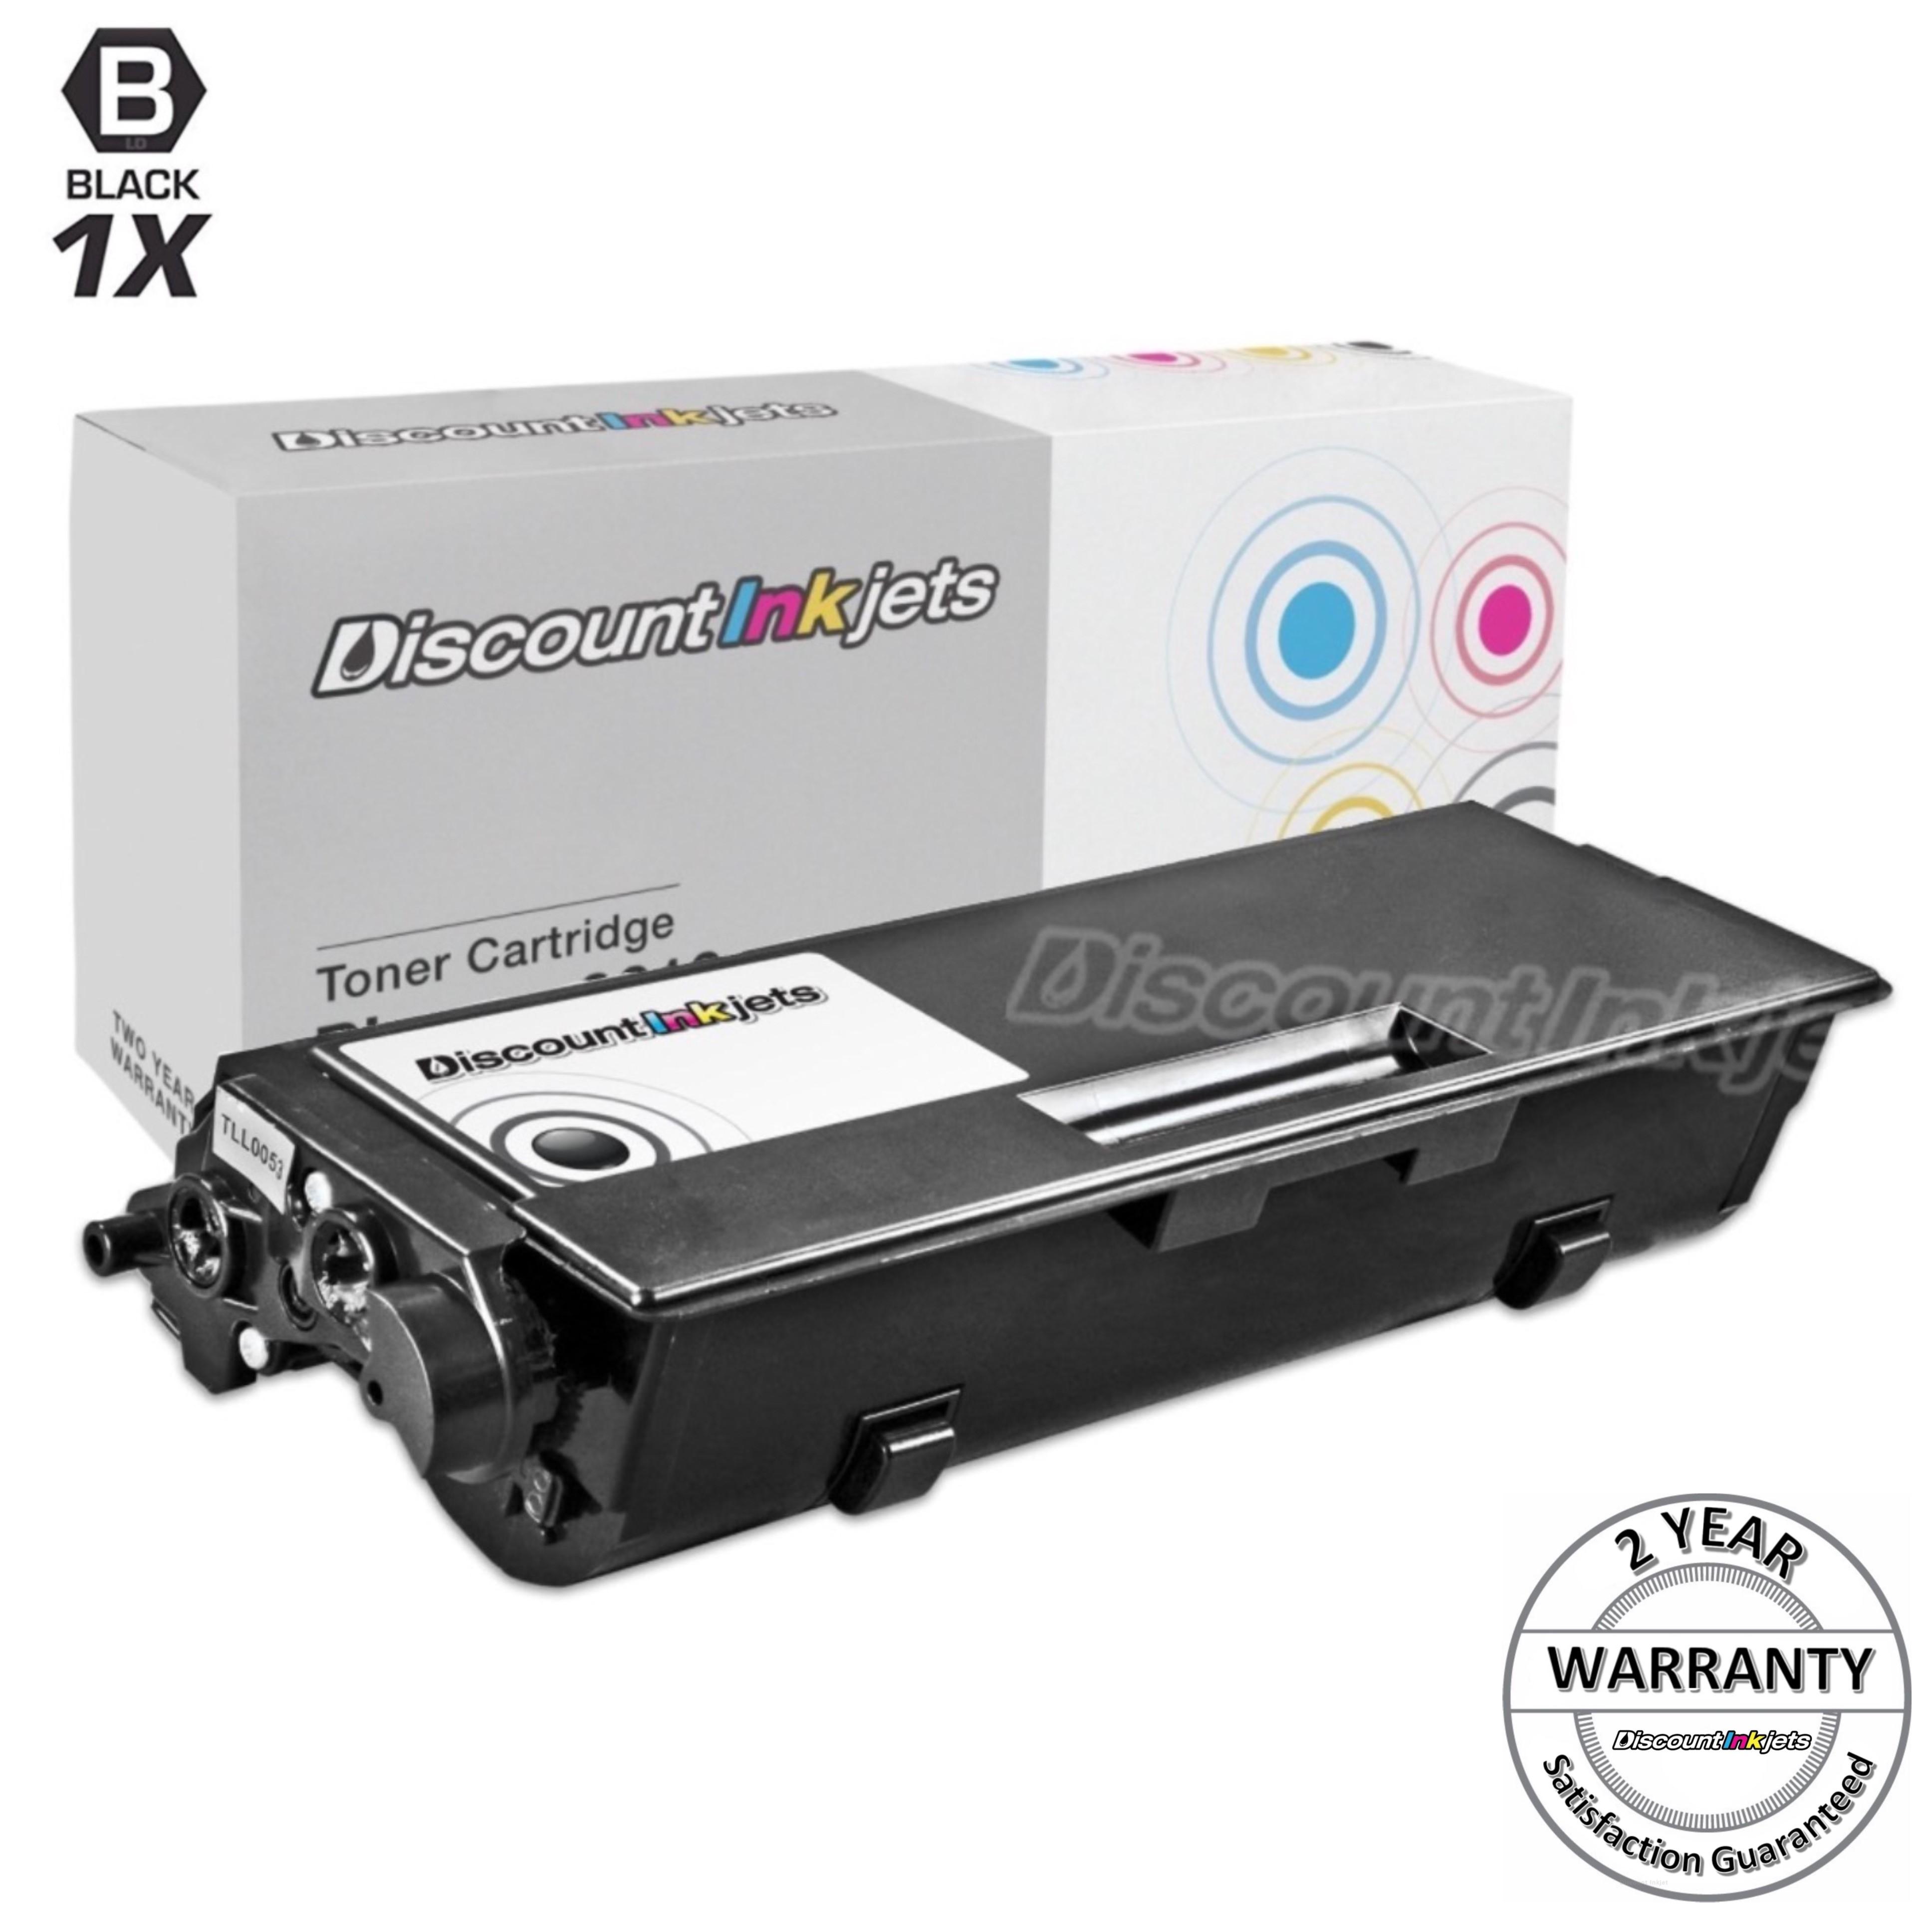 TN-560 for Brother Black Toner Cartridge High Yield DCP-8020 HL-1650 TN560 TN530